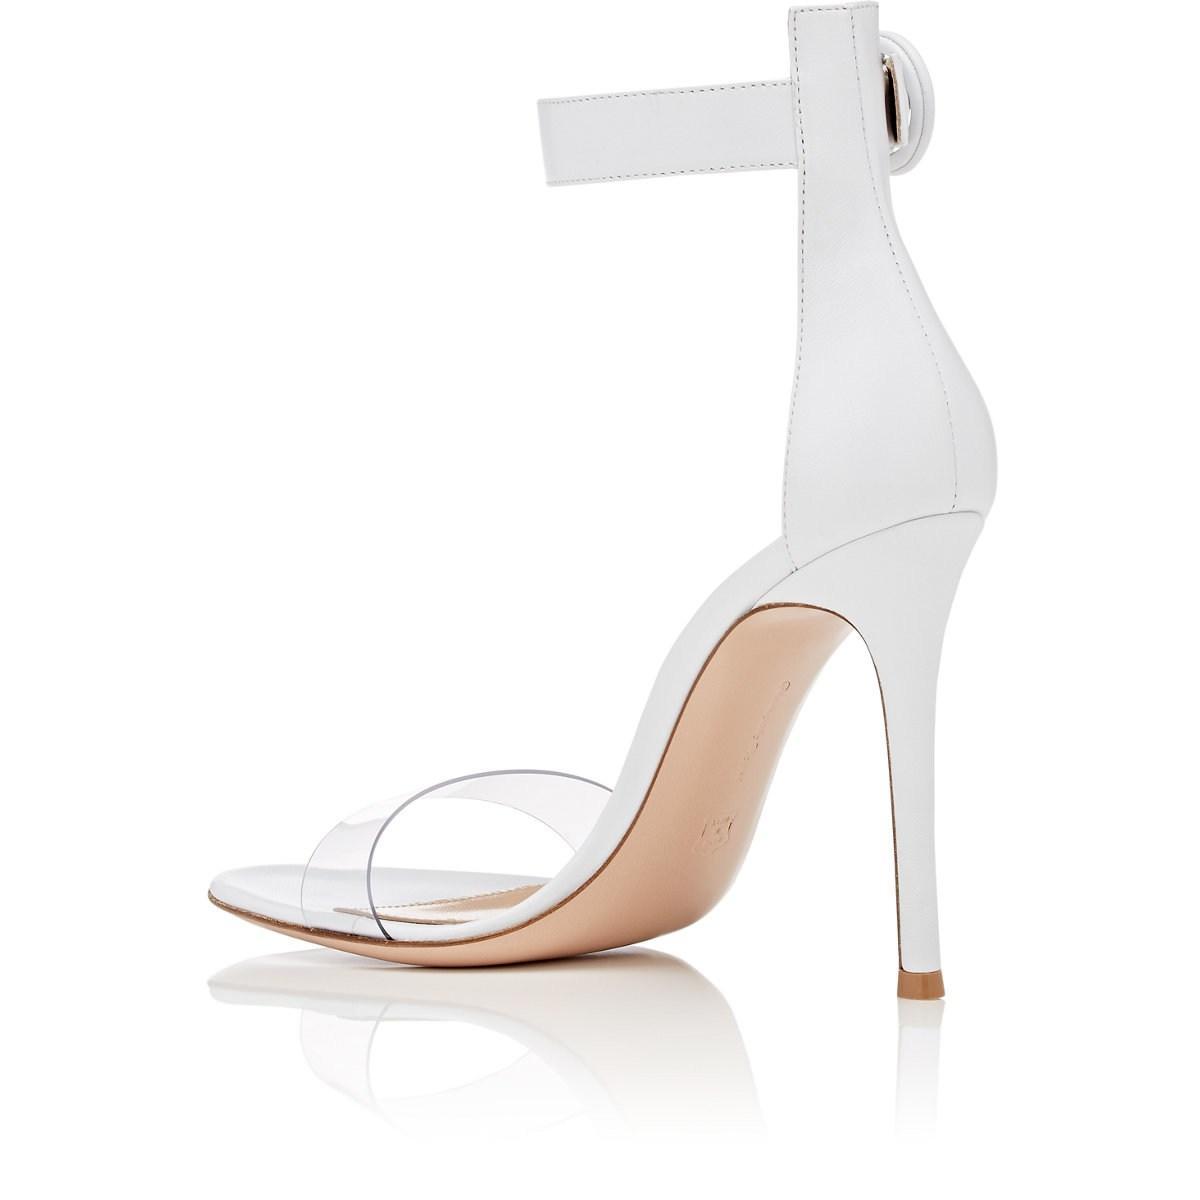 7d176bdaca9 Gianvito Rossi - White Stella Leather   Pvc Sandals - Lyst. View fullscreen